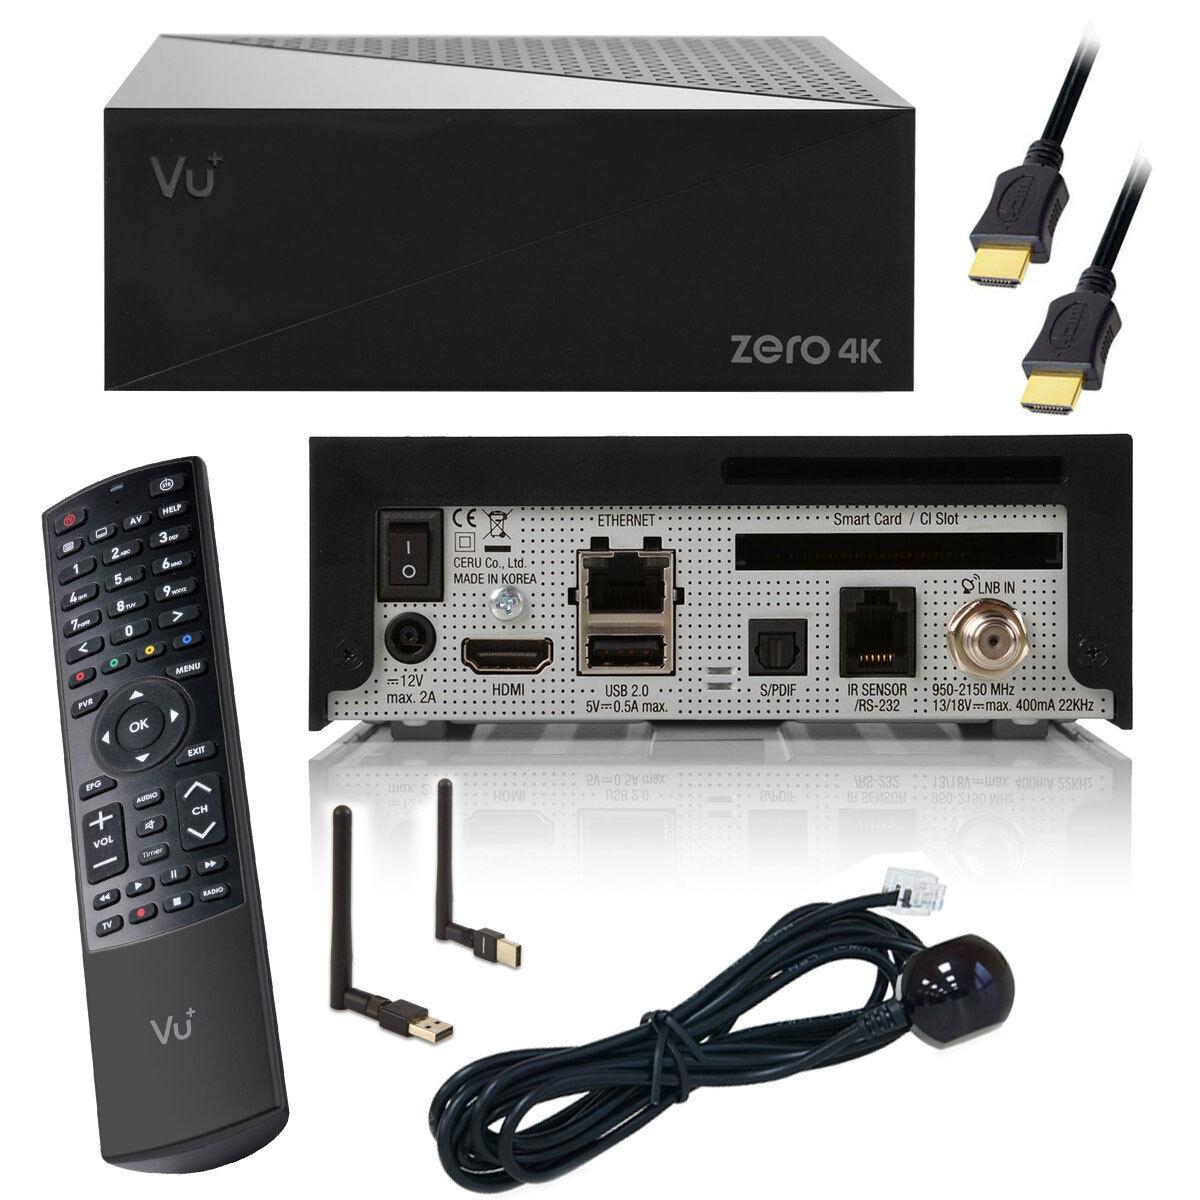 VU+ Zero 4K Sat-Receiver DVB-S2X Multistream Zero4K + Wifi Stick USB WLAN HDMI